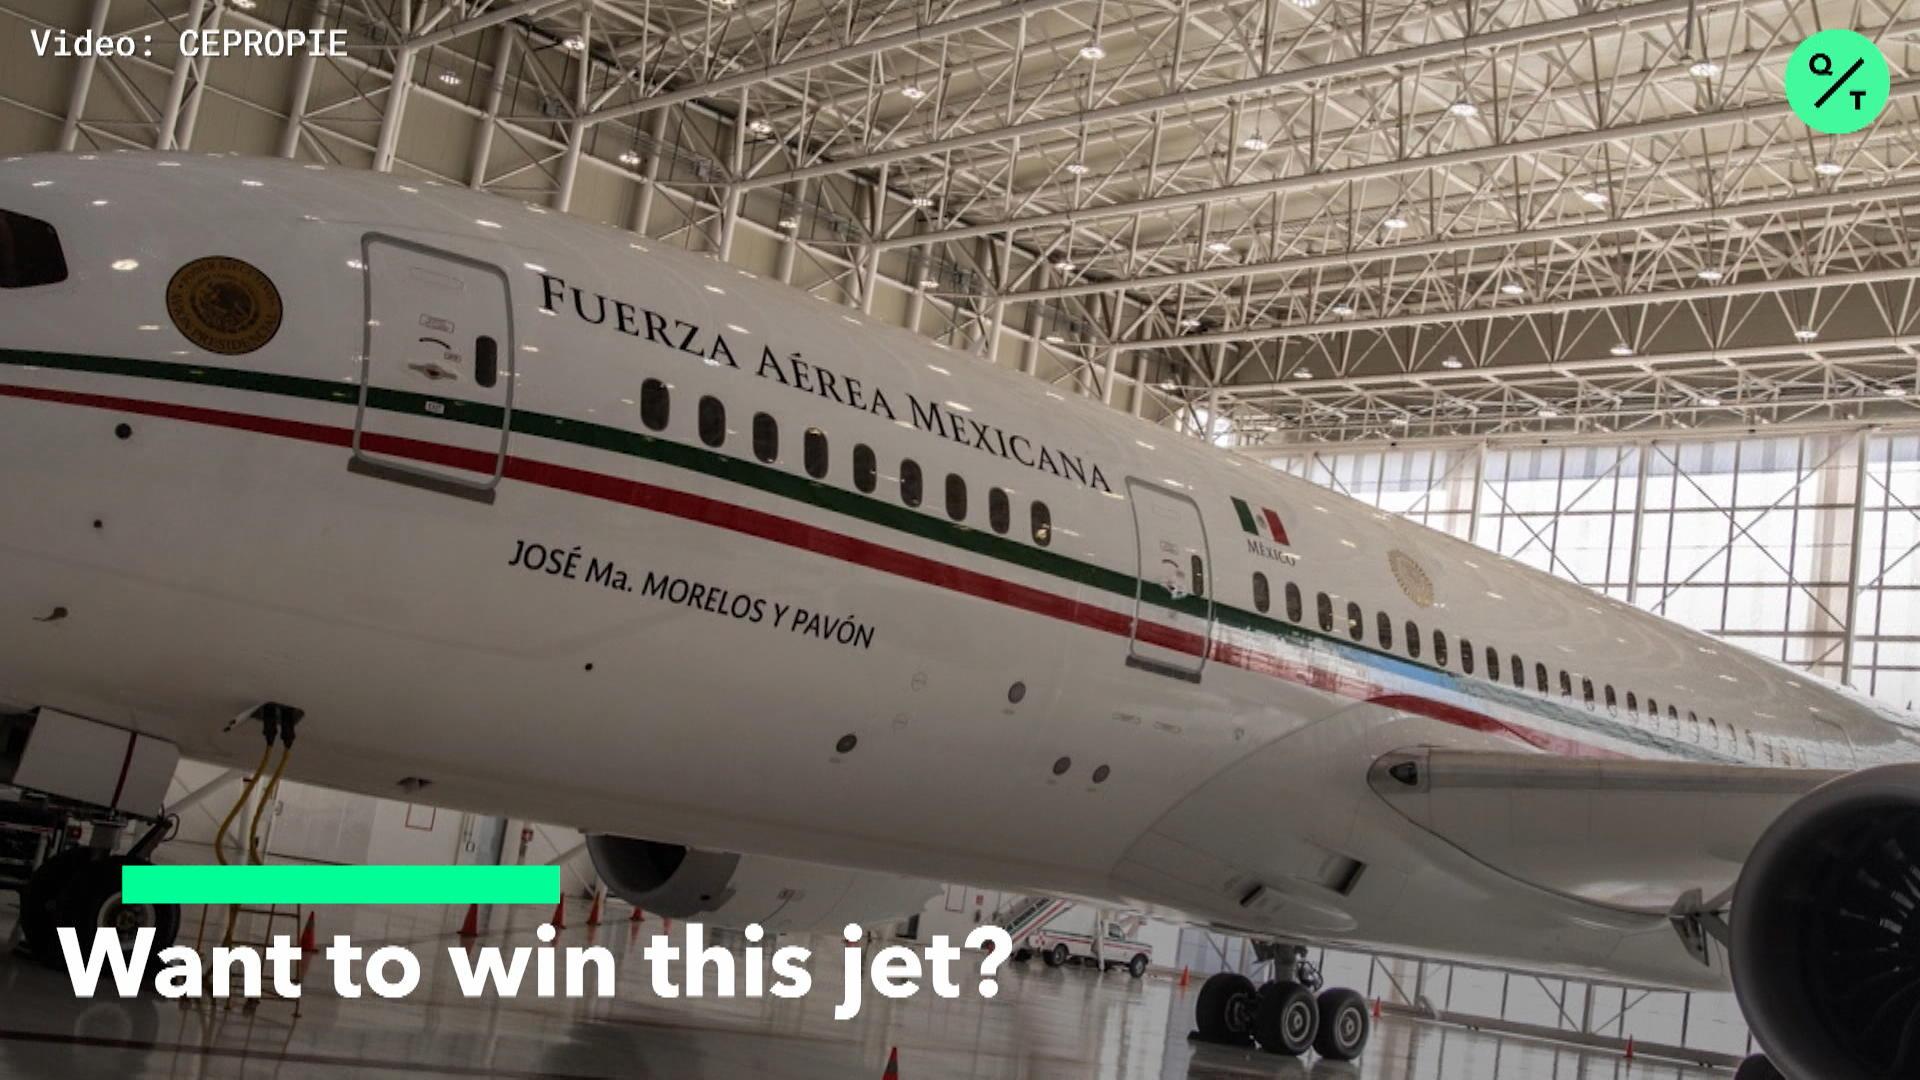 AMLO Wants To Raffle Jet